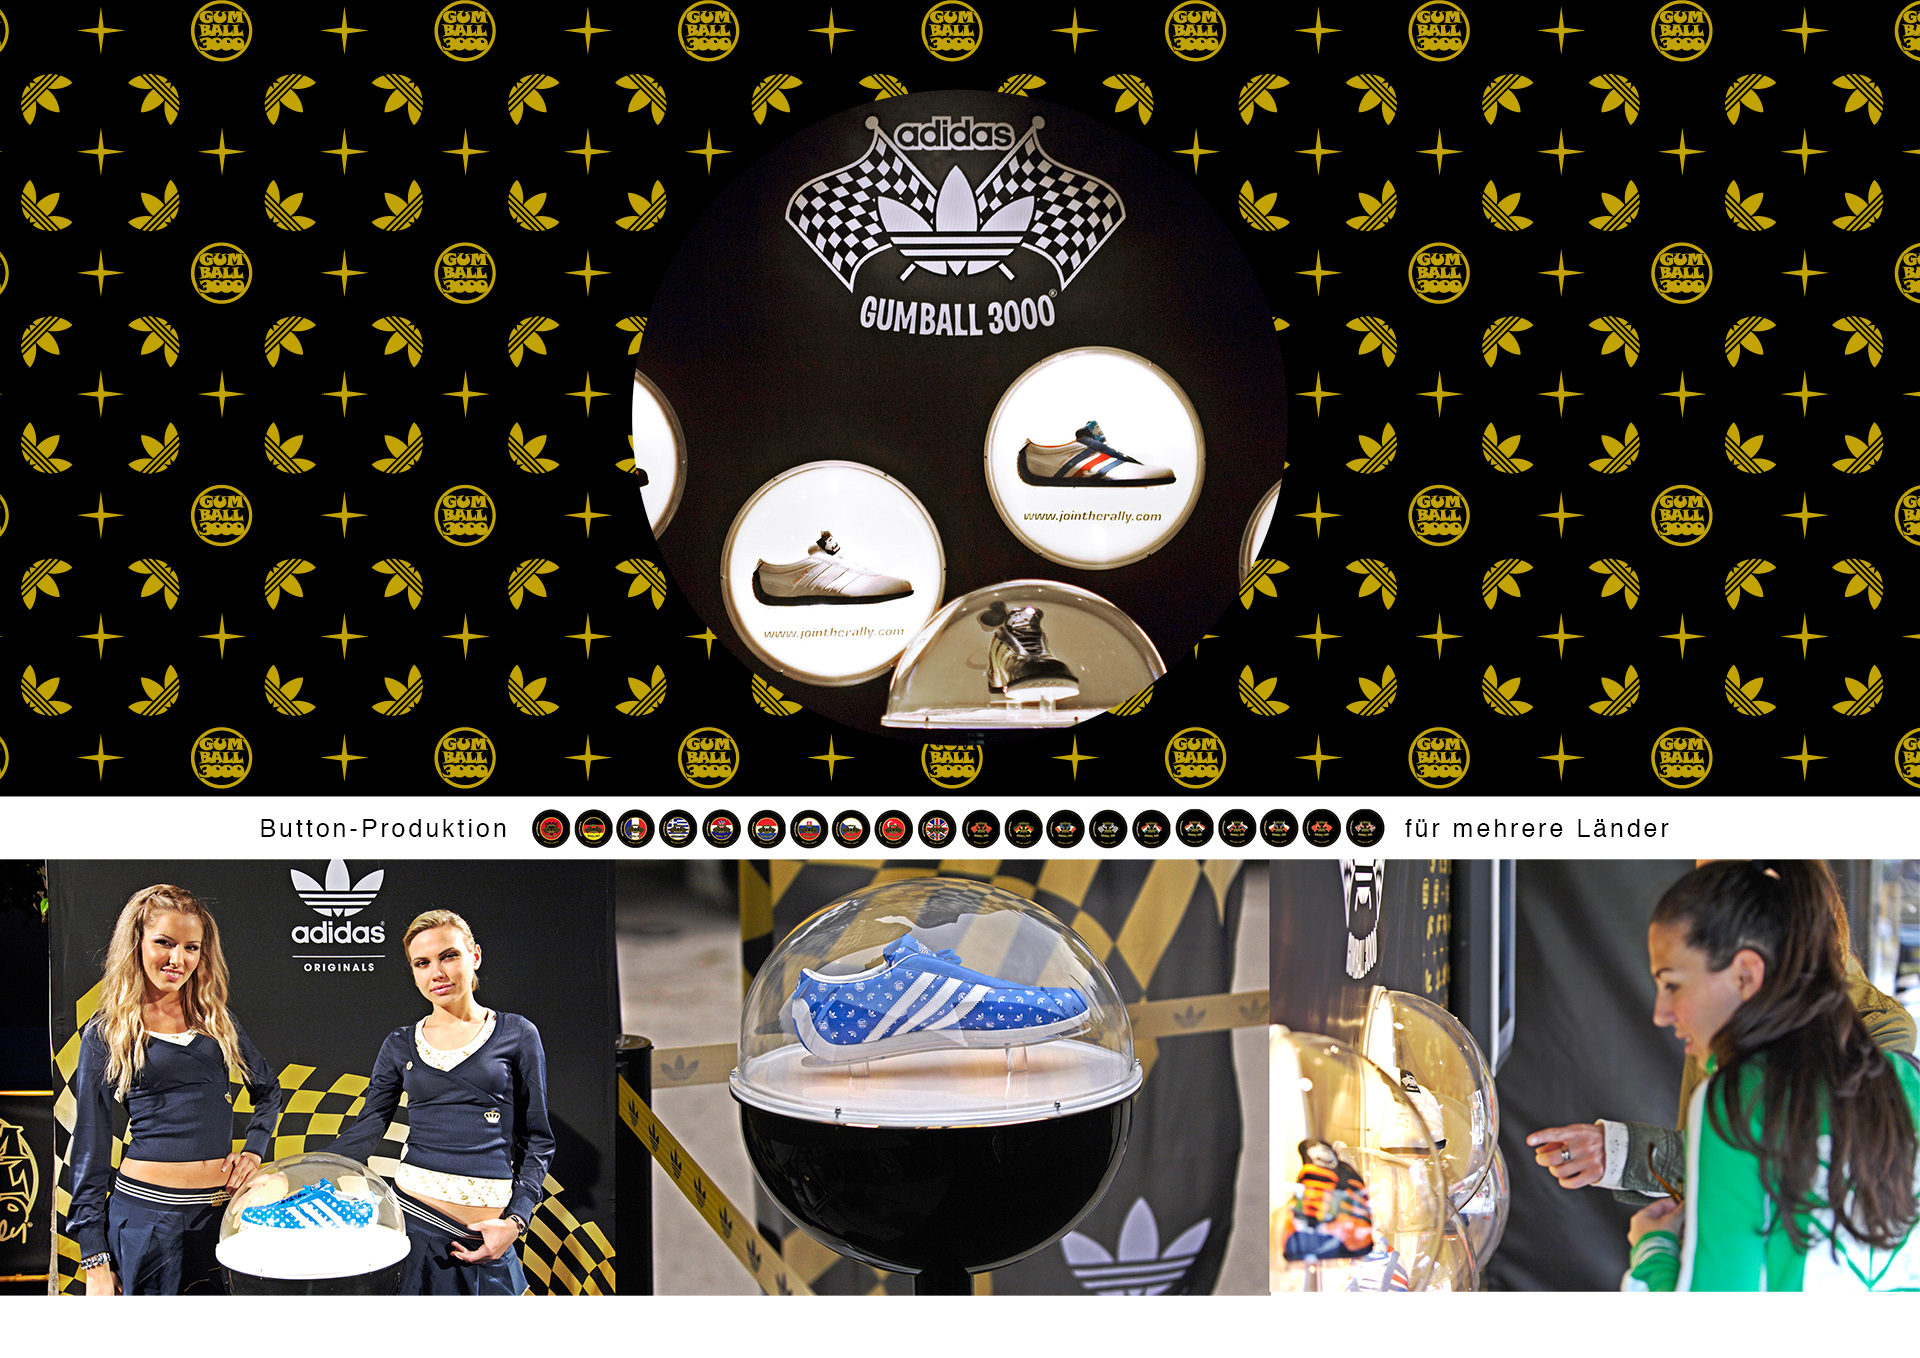 adidas gumball 3000,adidas schuhe, shoes, präsentation, 2007,schuhdisplay, halbkugel, hostessen, adidas promotion, werbung, stand, europatour, ci, agentur, bochum